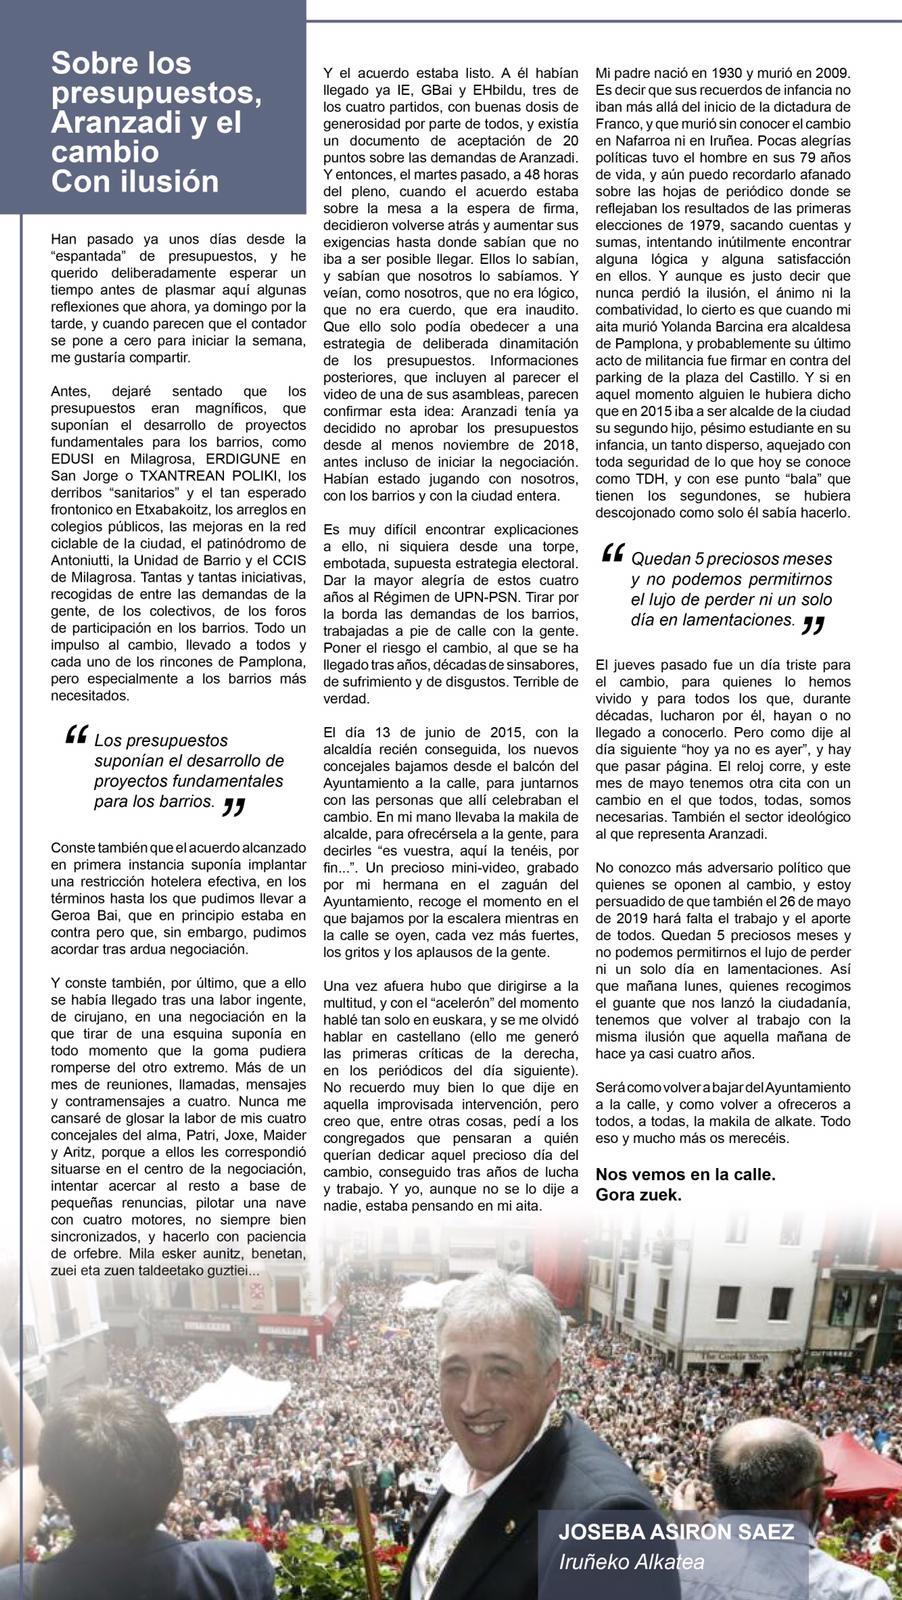 LA PELOTA VASCA - Página 8 Dw3aub3XcAALbrG?format=jpg&name=large